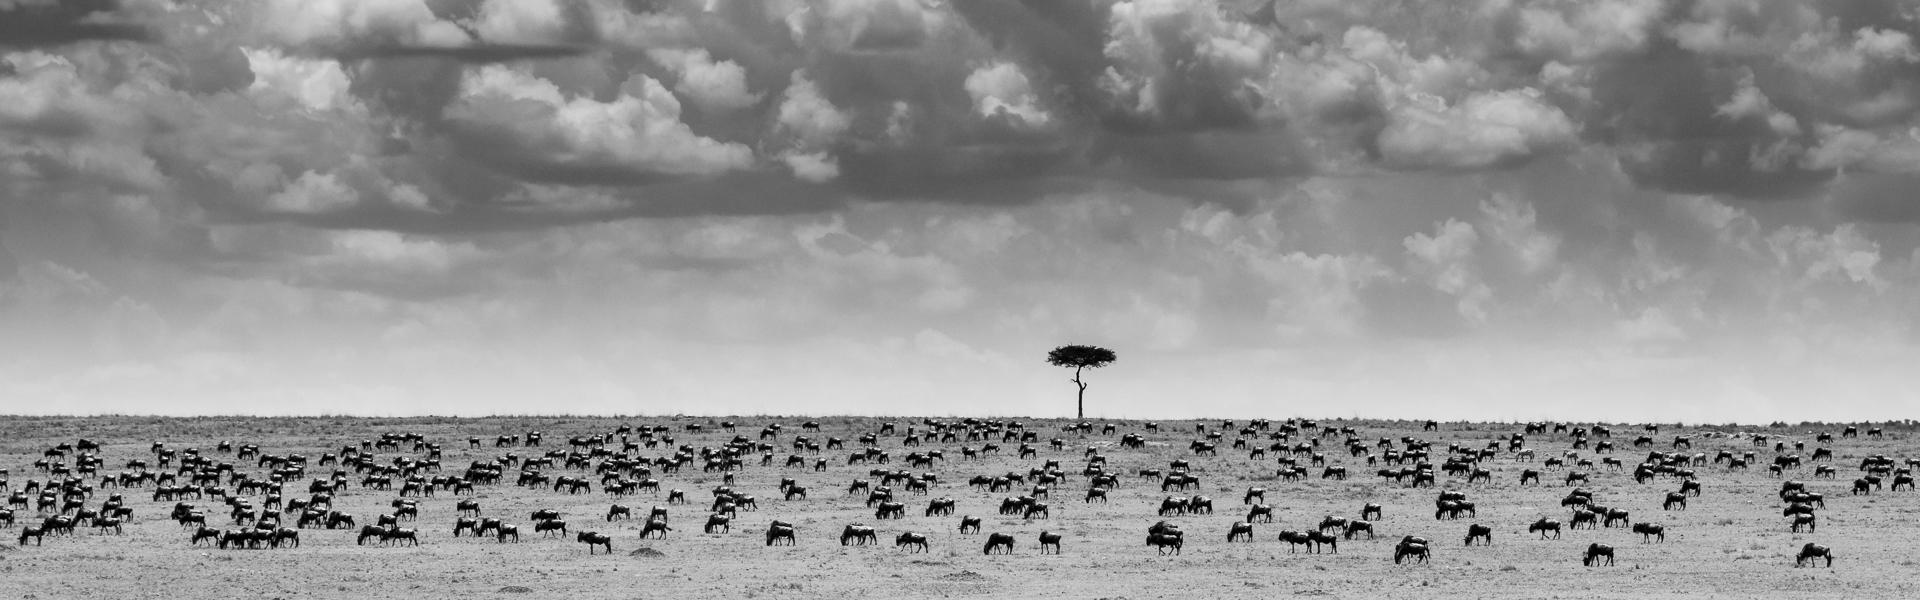 Maasai Skies-Nicholas-Moschides_slider